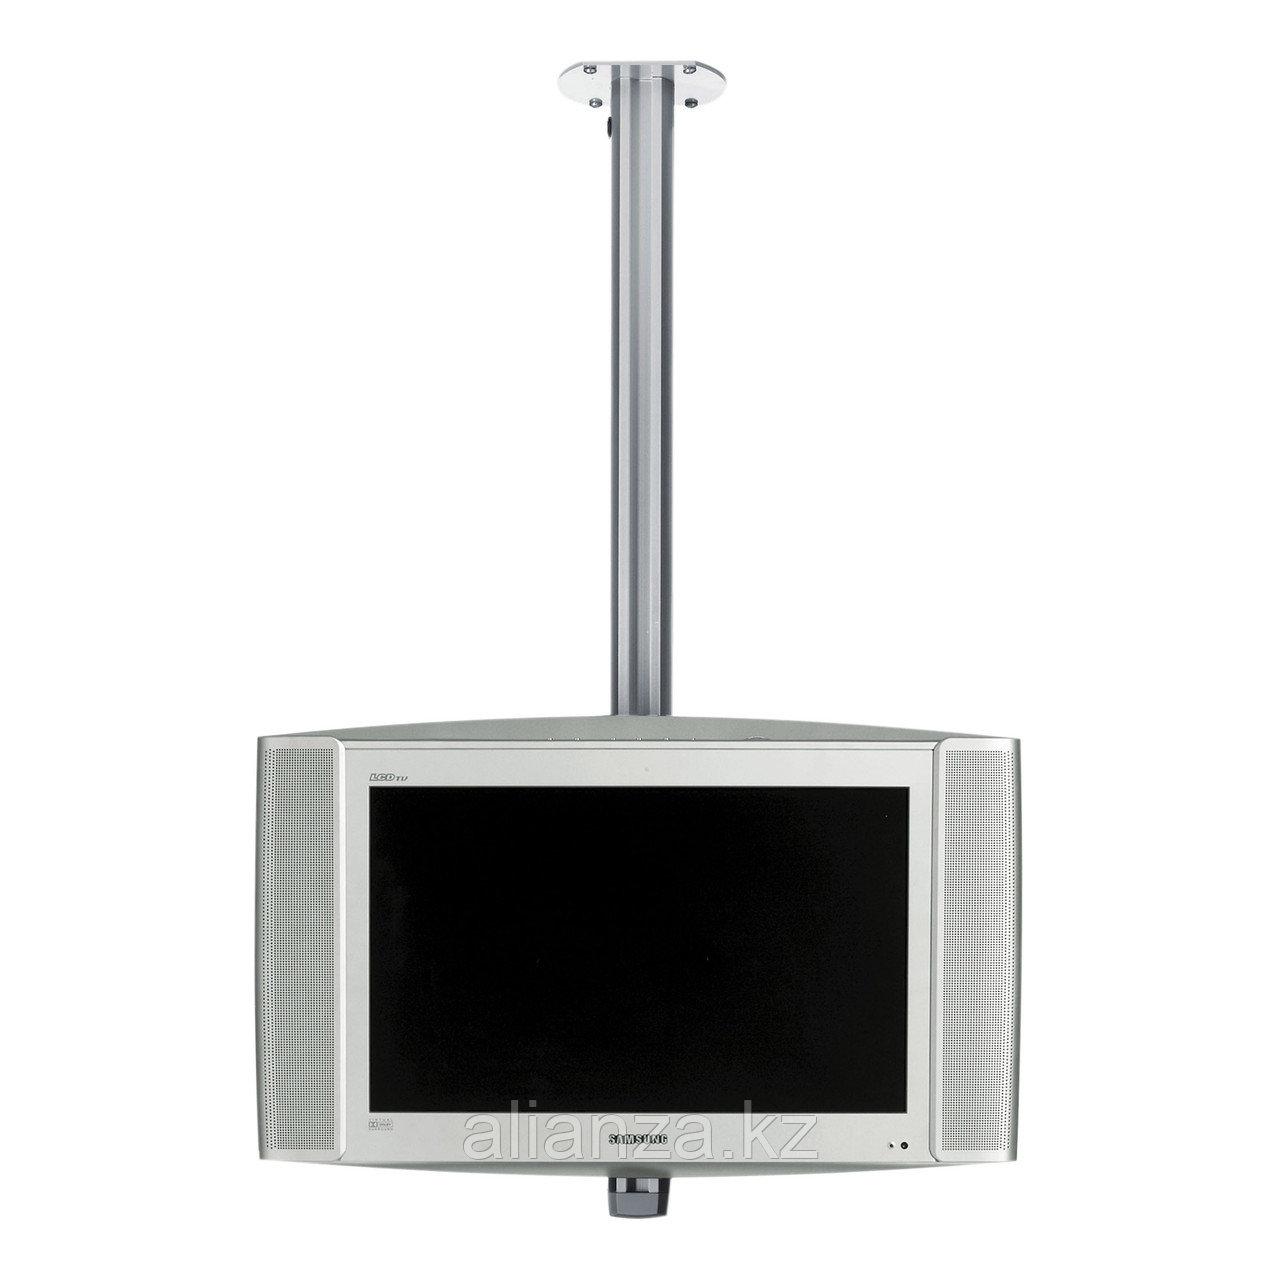 Кронштейн для телевизора SMS Flatscreen CL ST800 (потолочное крепление для телевизоров до 26)